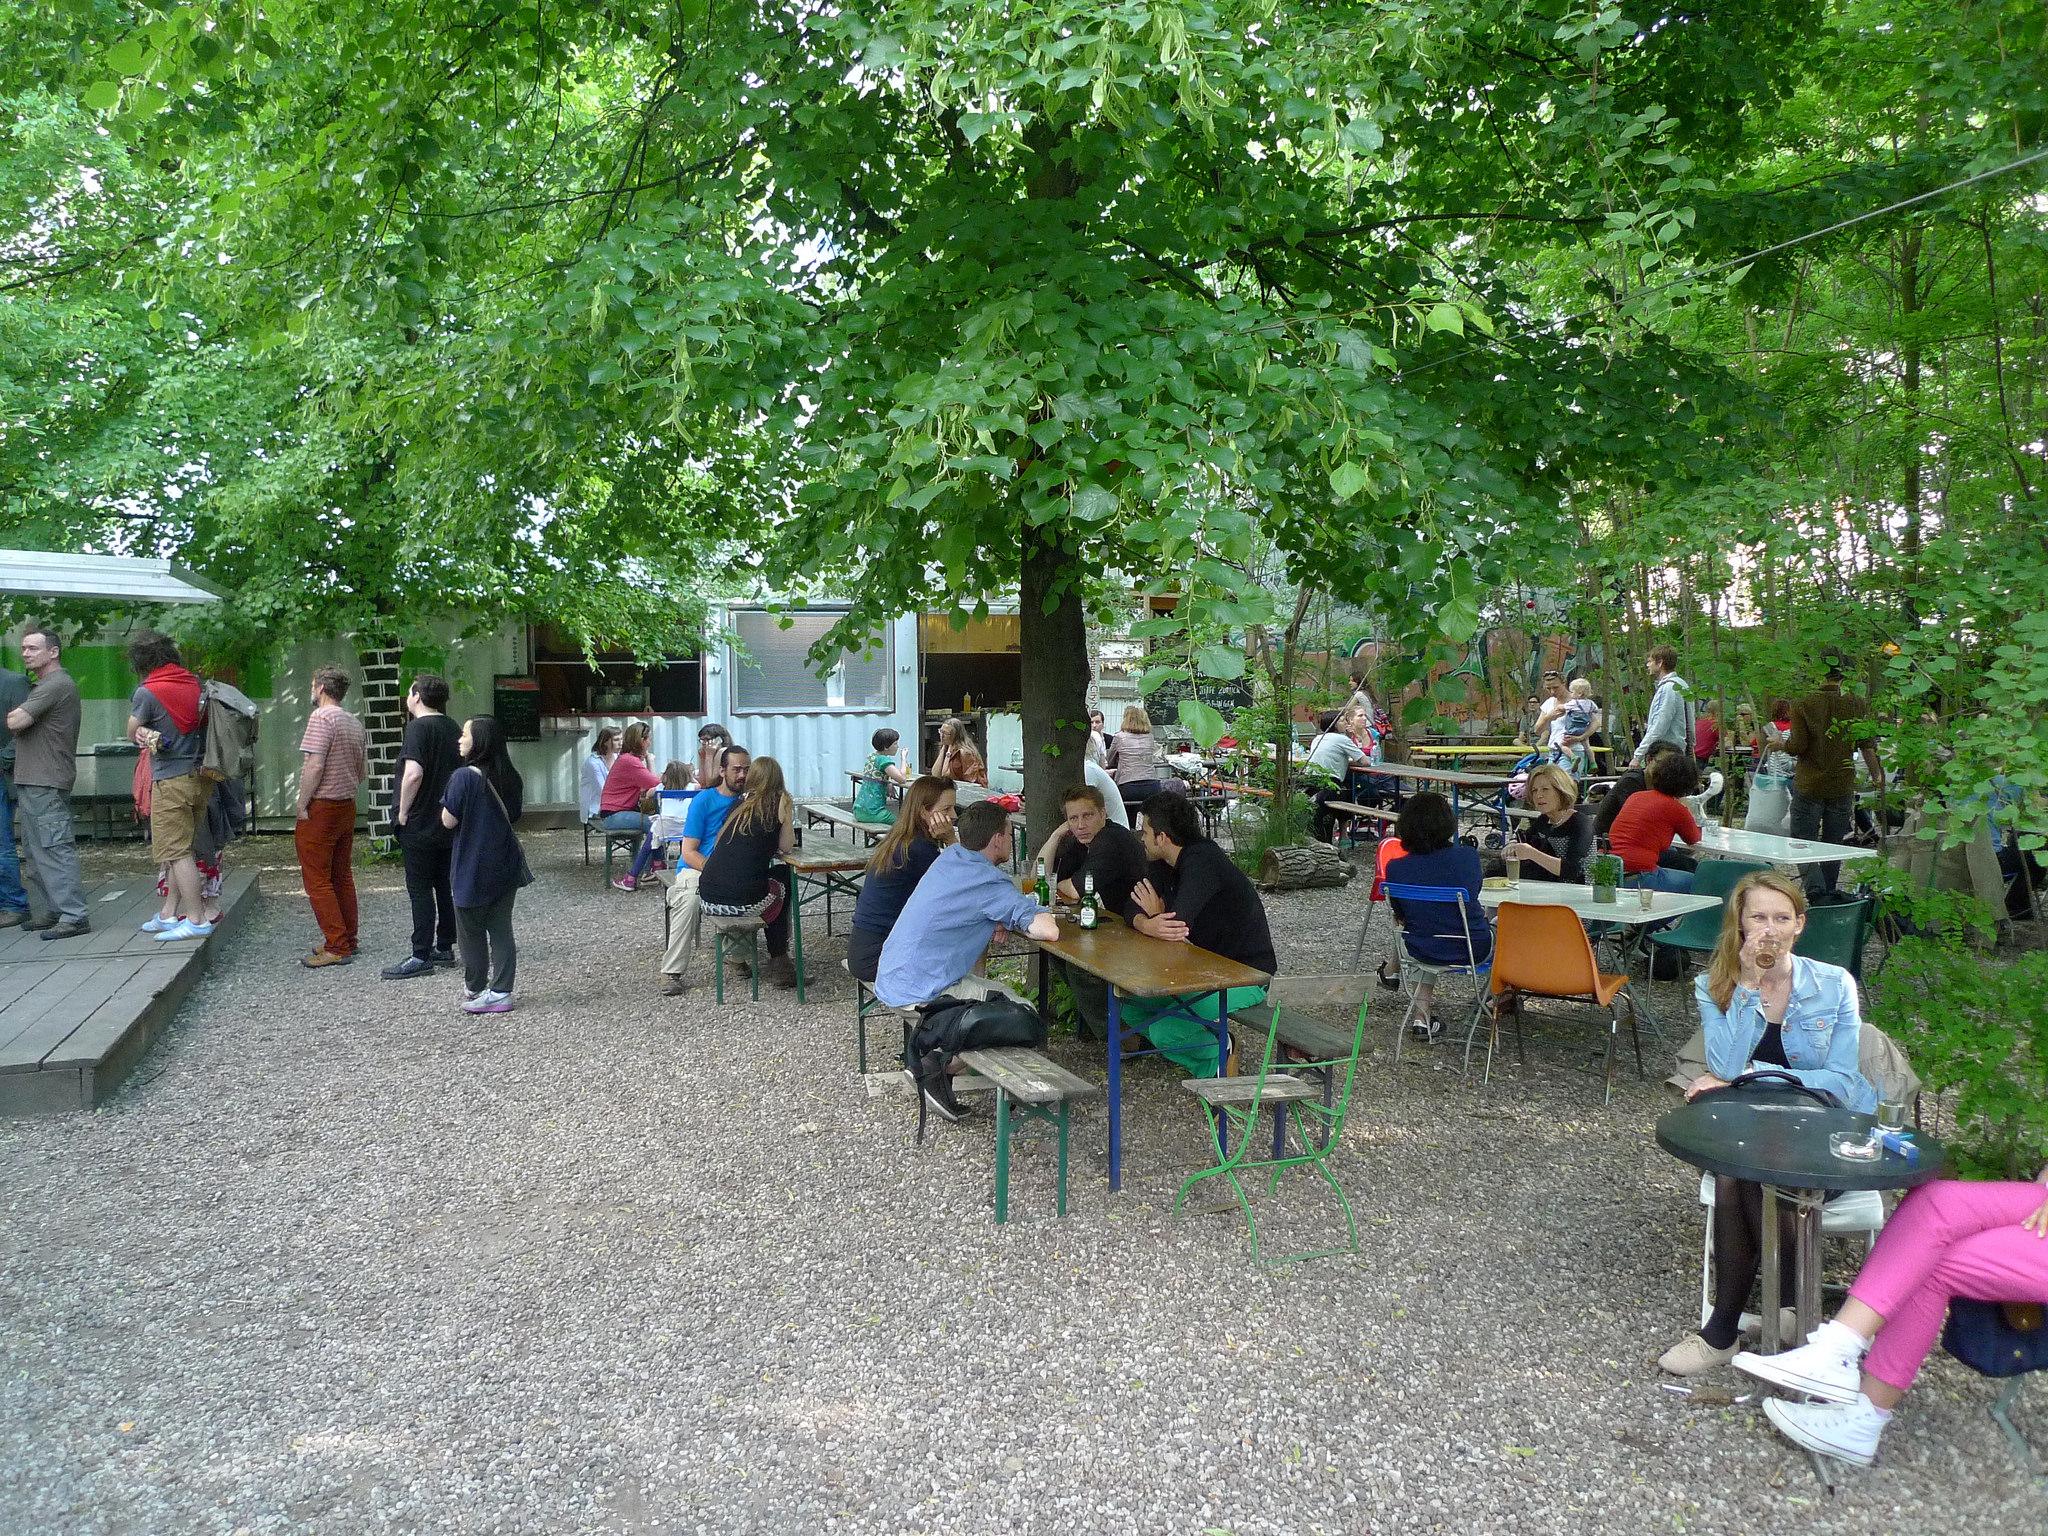 urban gardening a look at berlin 39 s prinzessinneng rten. Black Bedroom Furniture Sets. Home Design Ideas